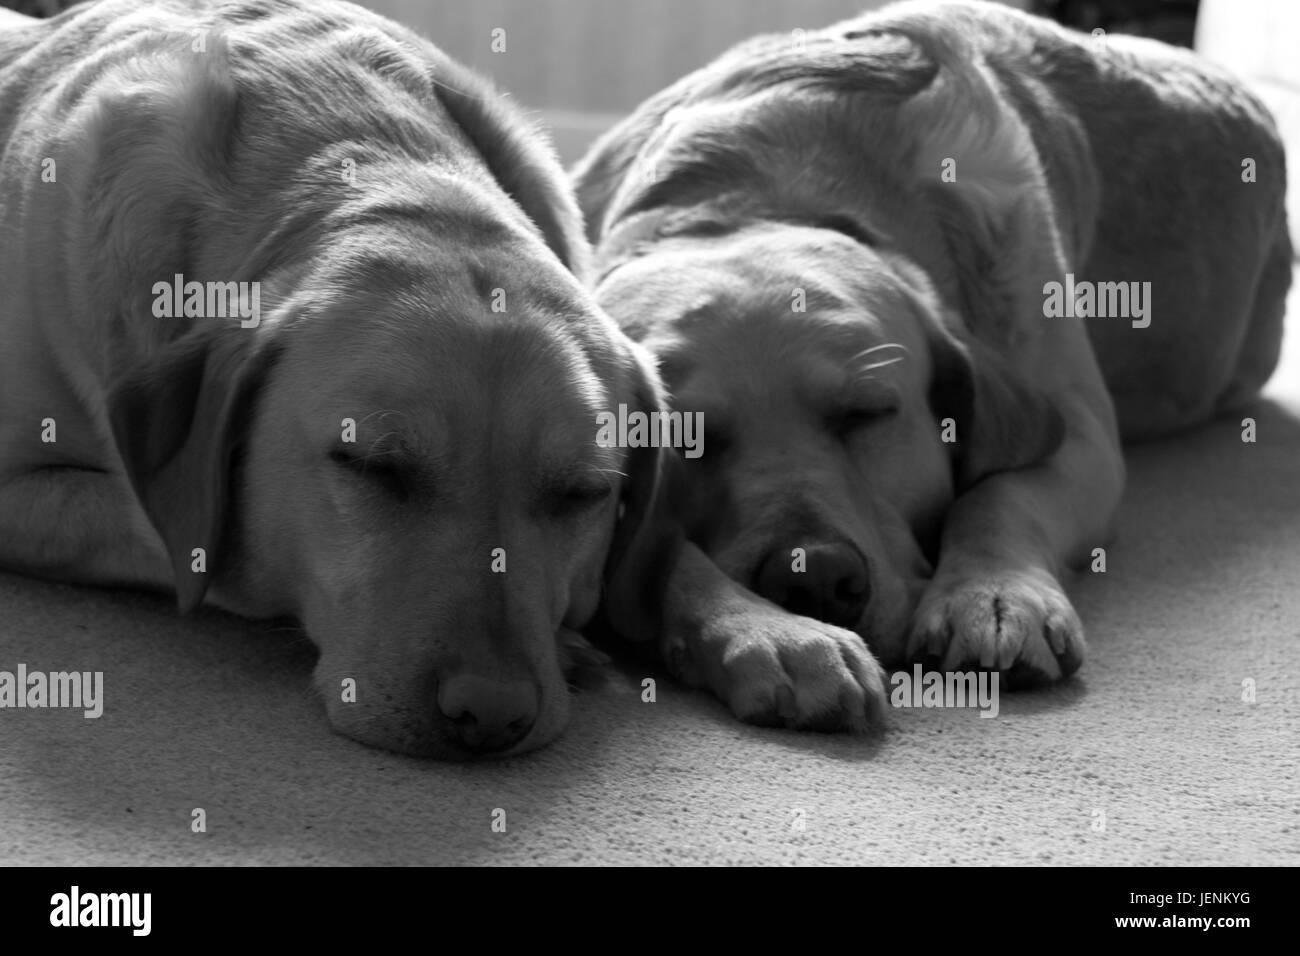 Sleeping Dogs Lie - Stock Image